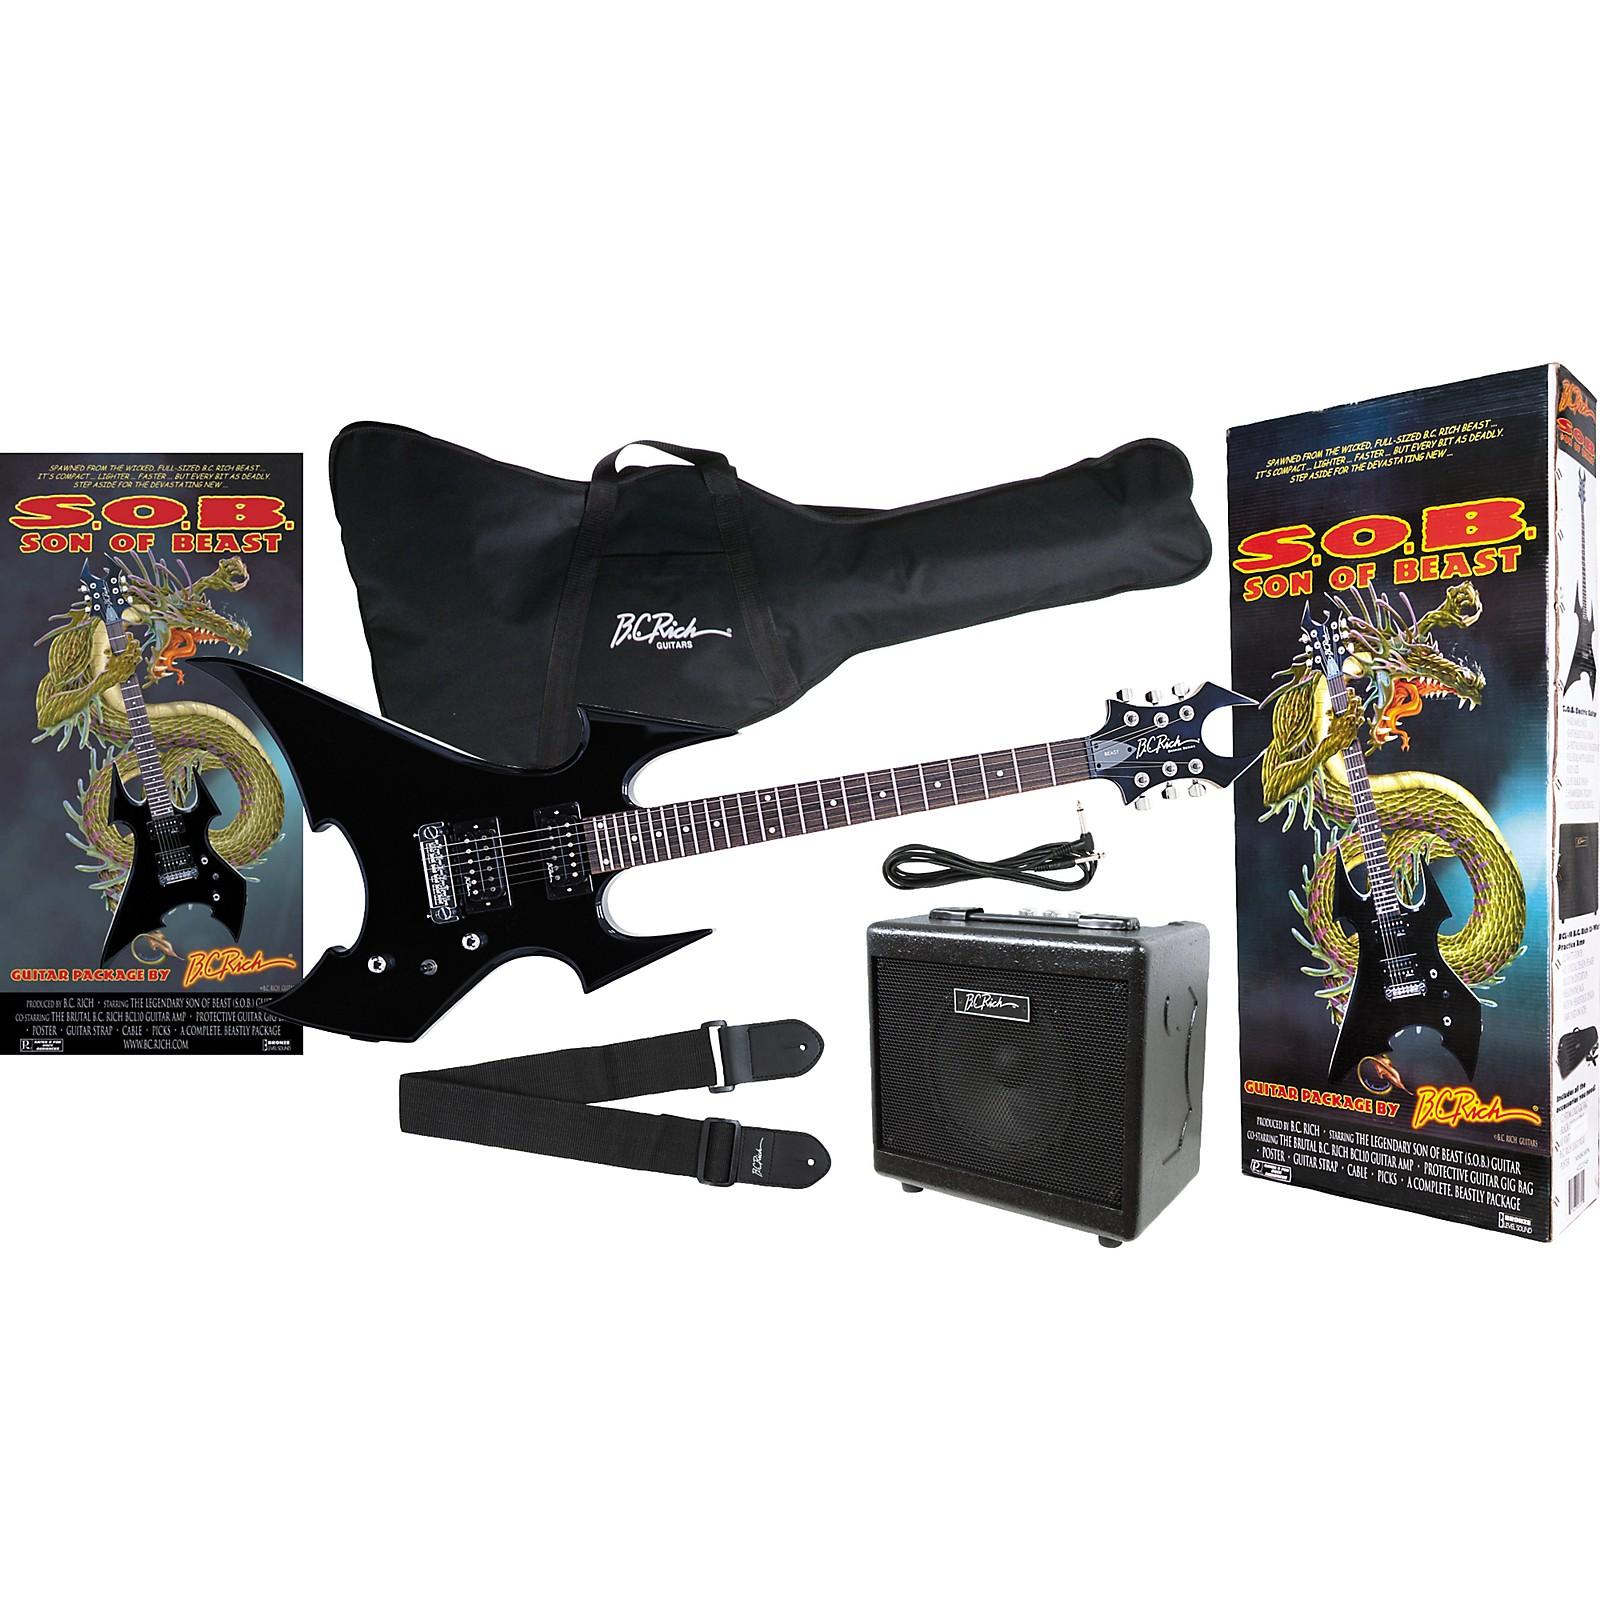 B.C. Rich Son Of Beast Guitar Pack